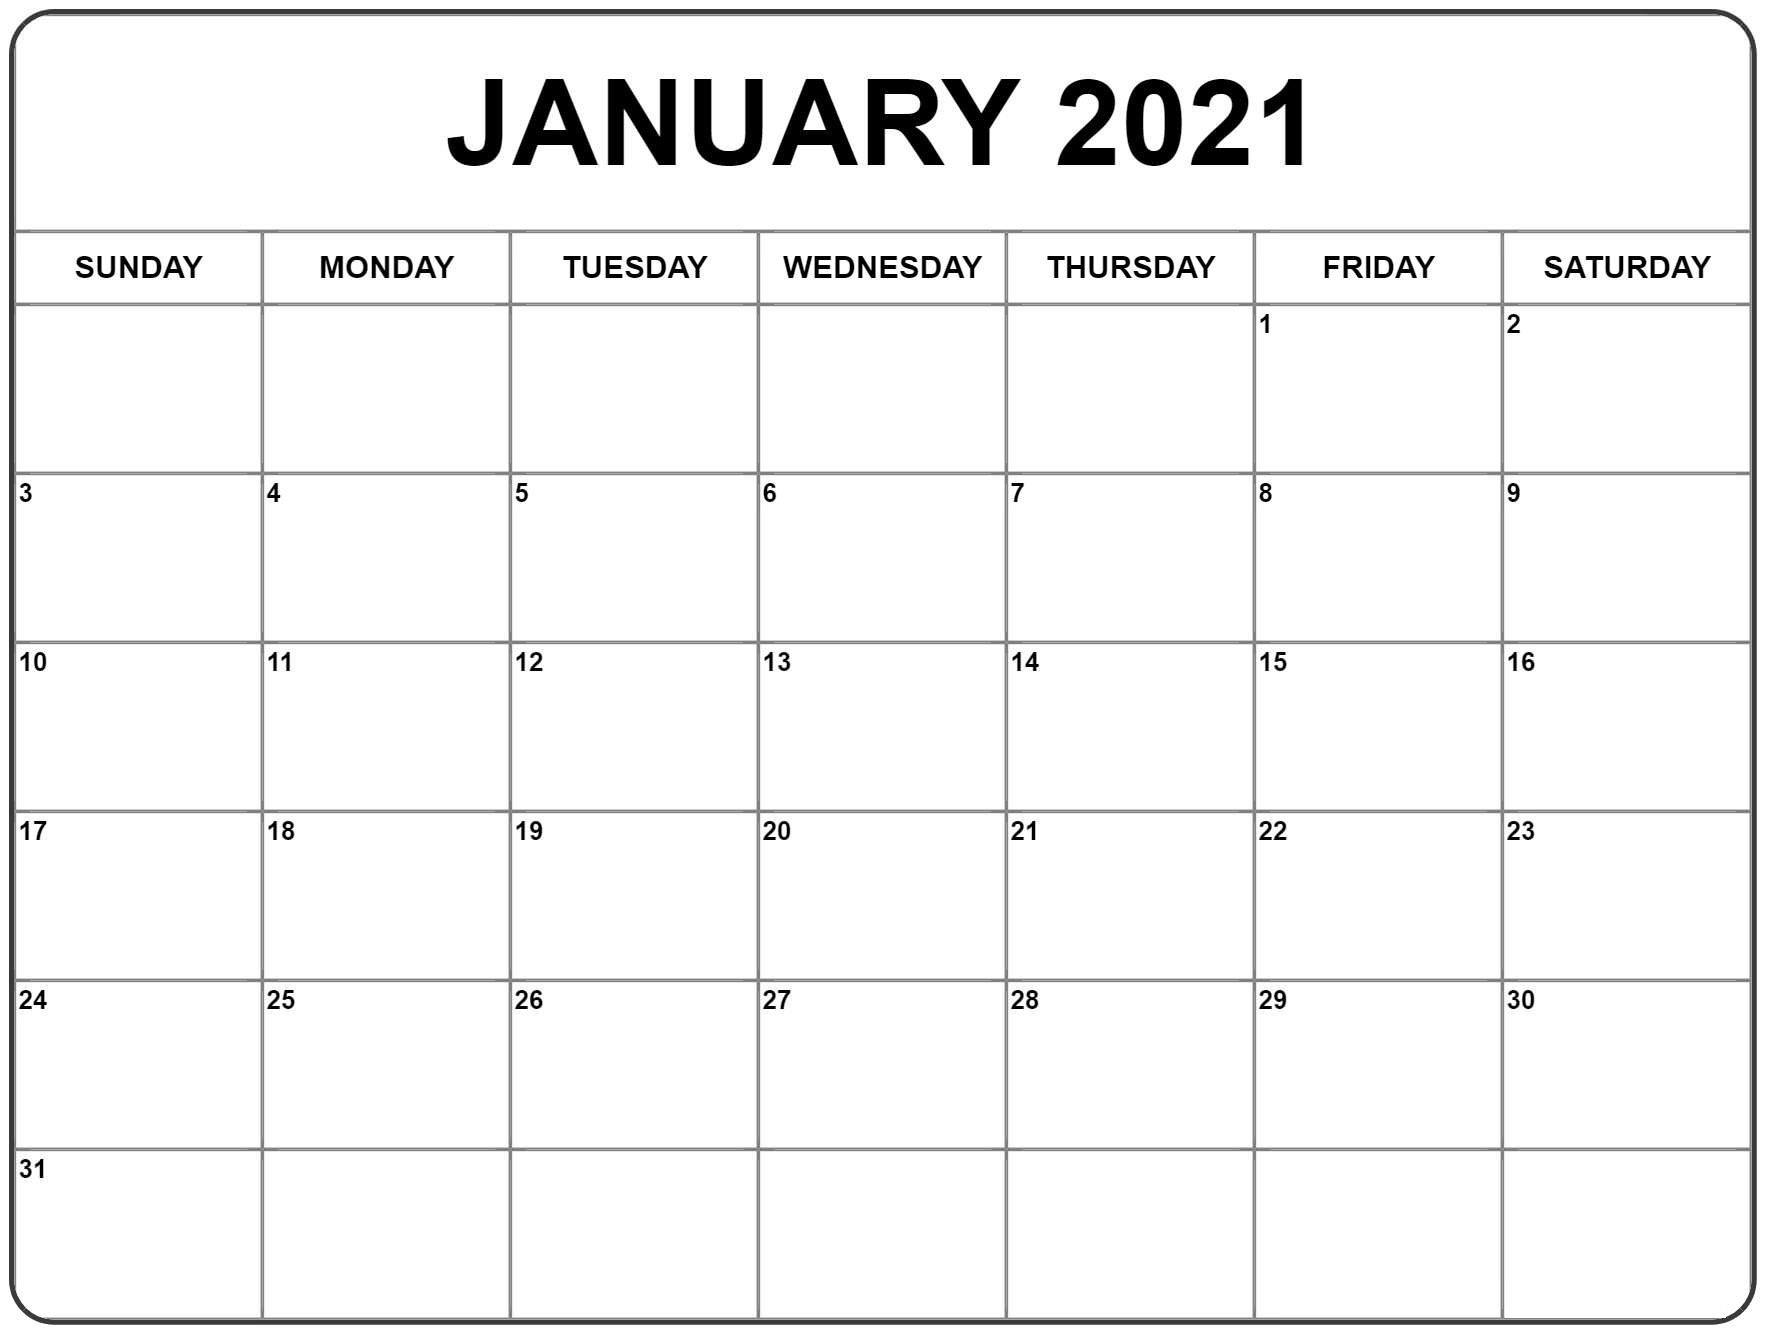 Free January 2021 Calendar Printable Blank Templates pertaining to Print Calendar 2021 Monthly Free Photo